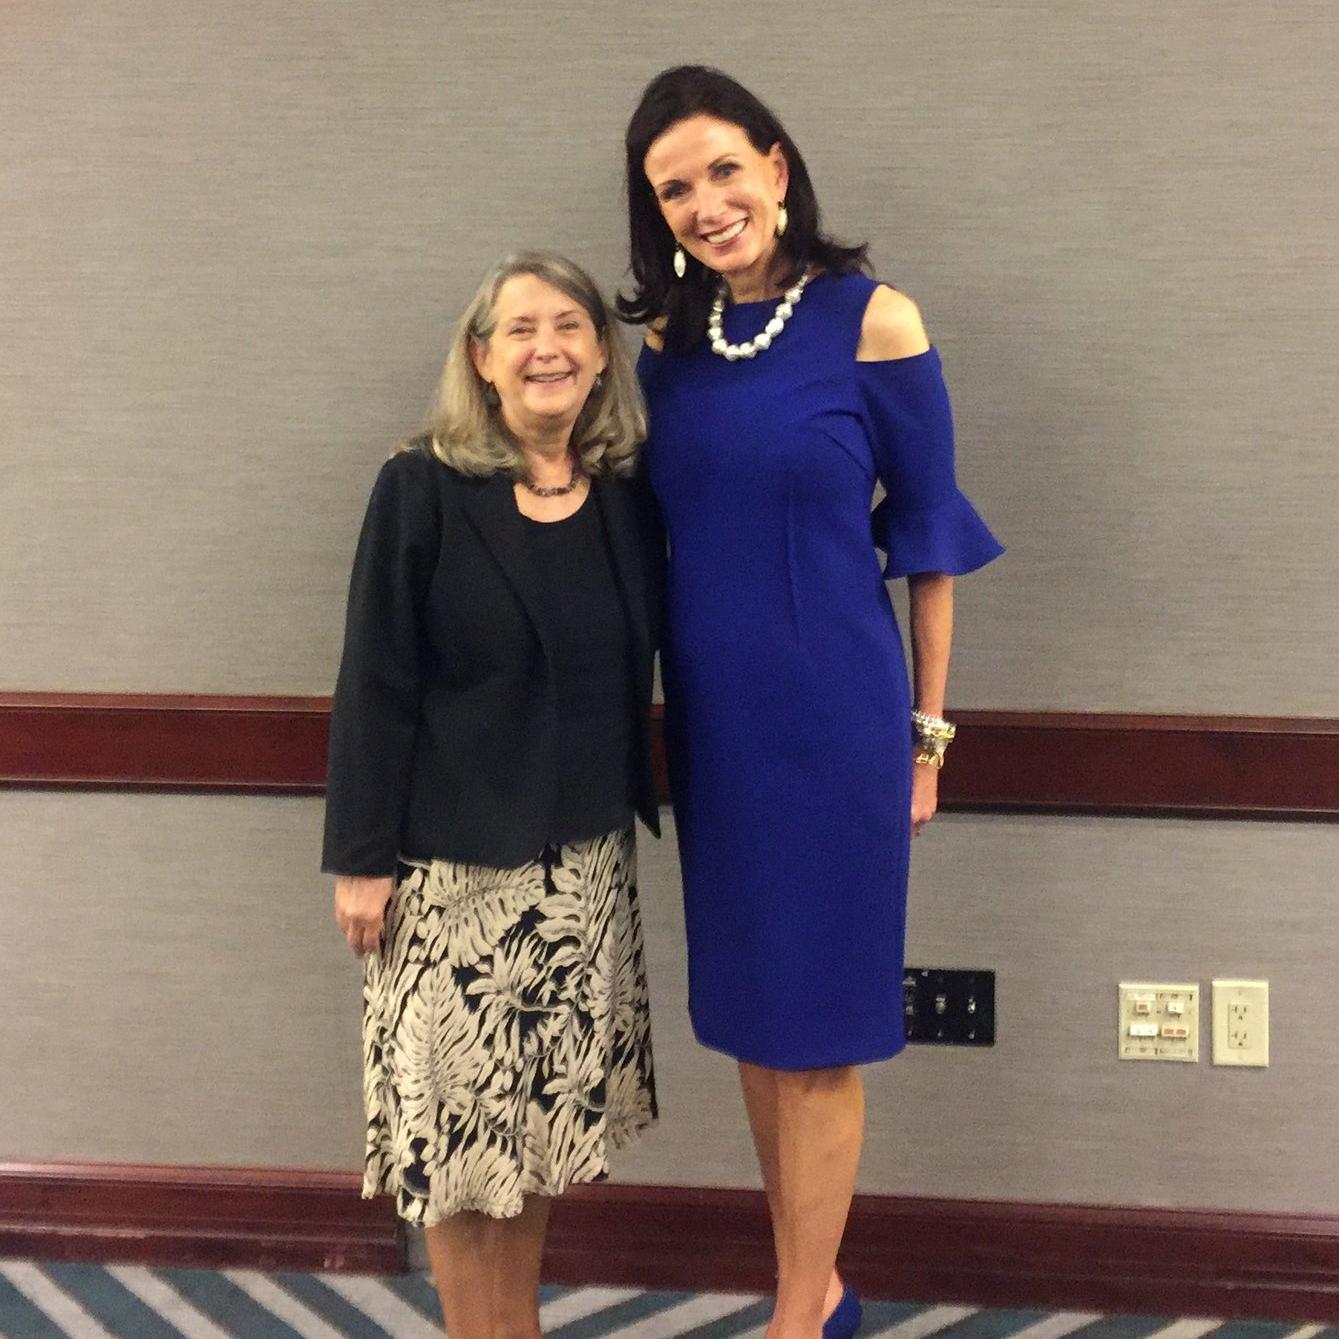 Karen with Kathy Whitmire, first female Mayor of Houston.